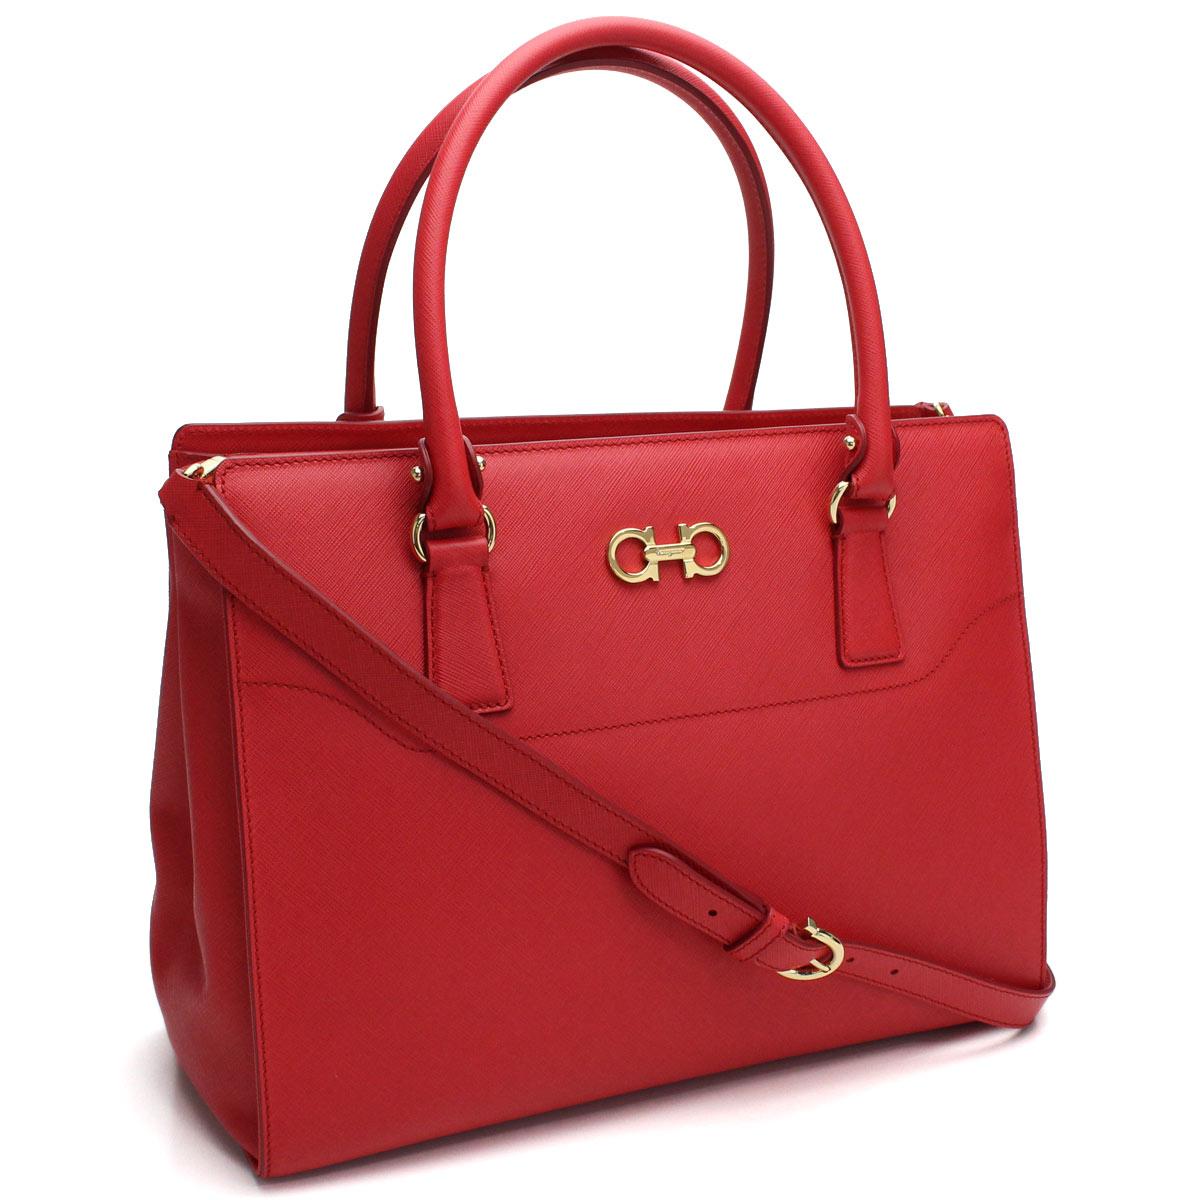 6fc37c541184 Bighit The total brand wholesale  Ferragamo (FERRAGAMO) BEKY handbag  21-F271 0655818 PAMPLONA